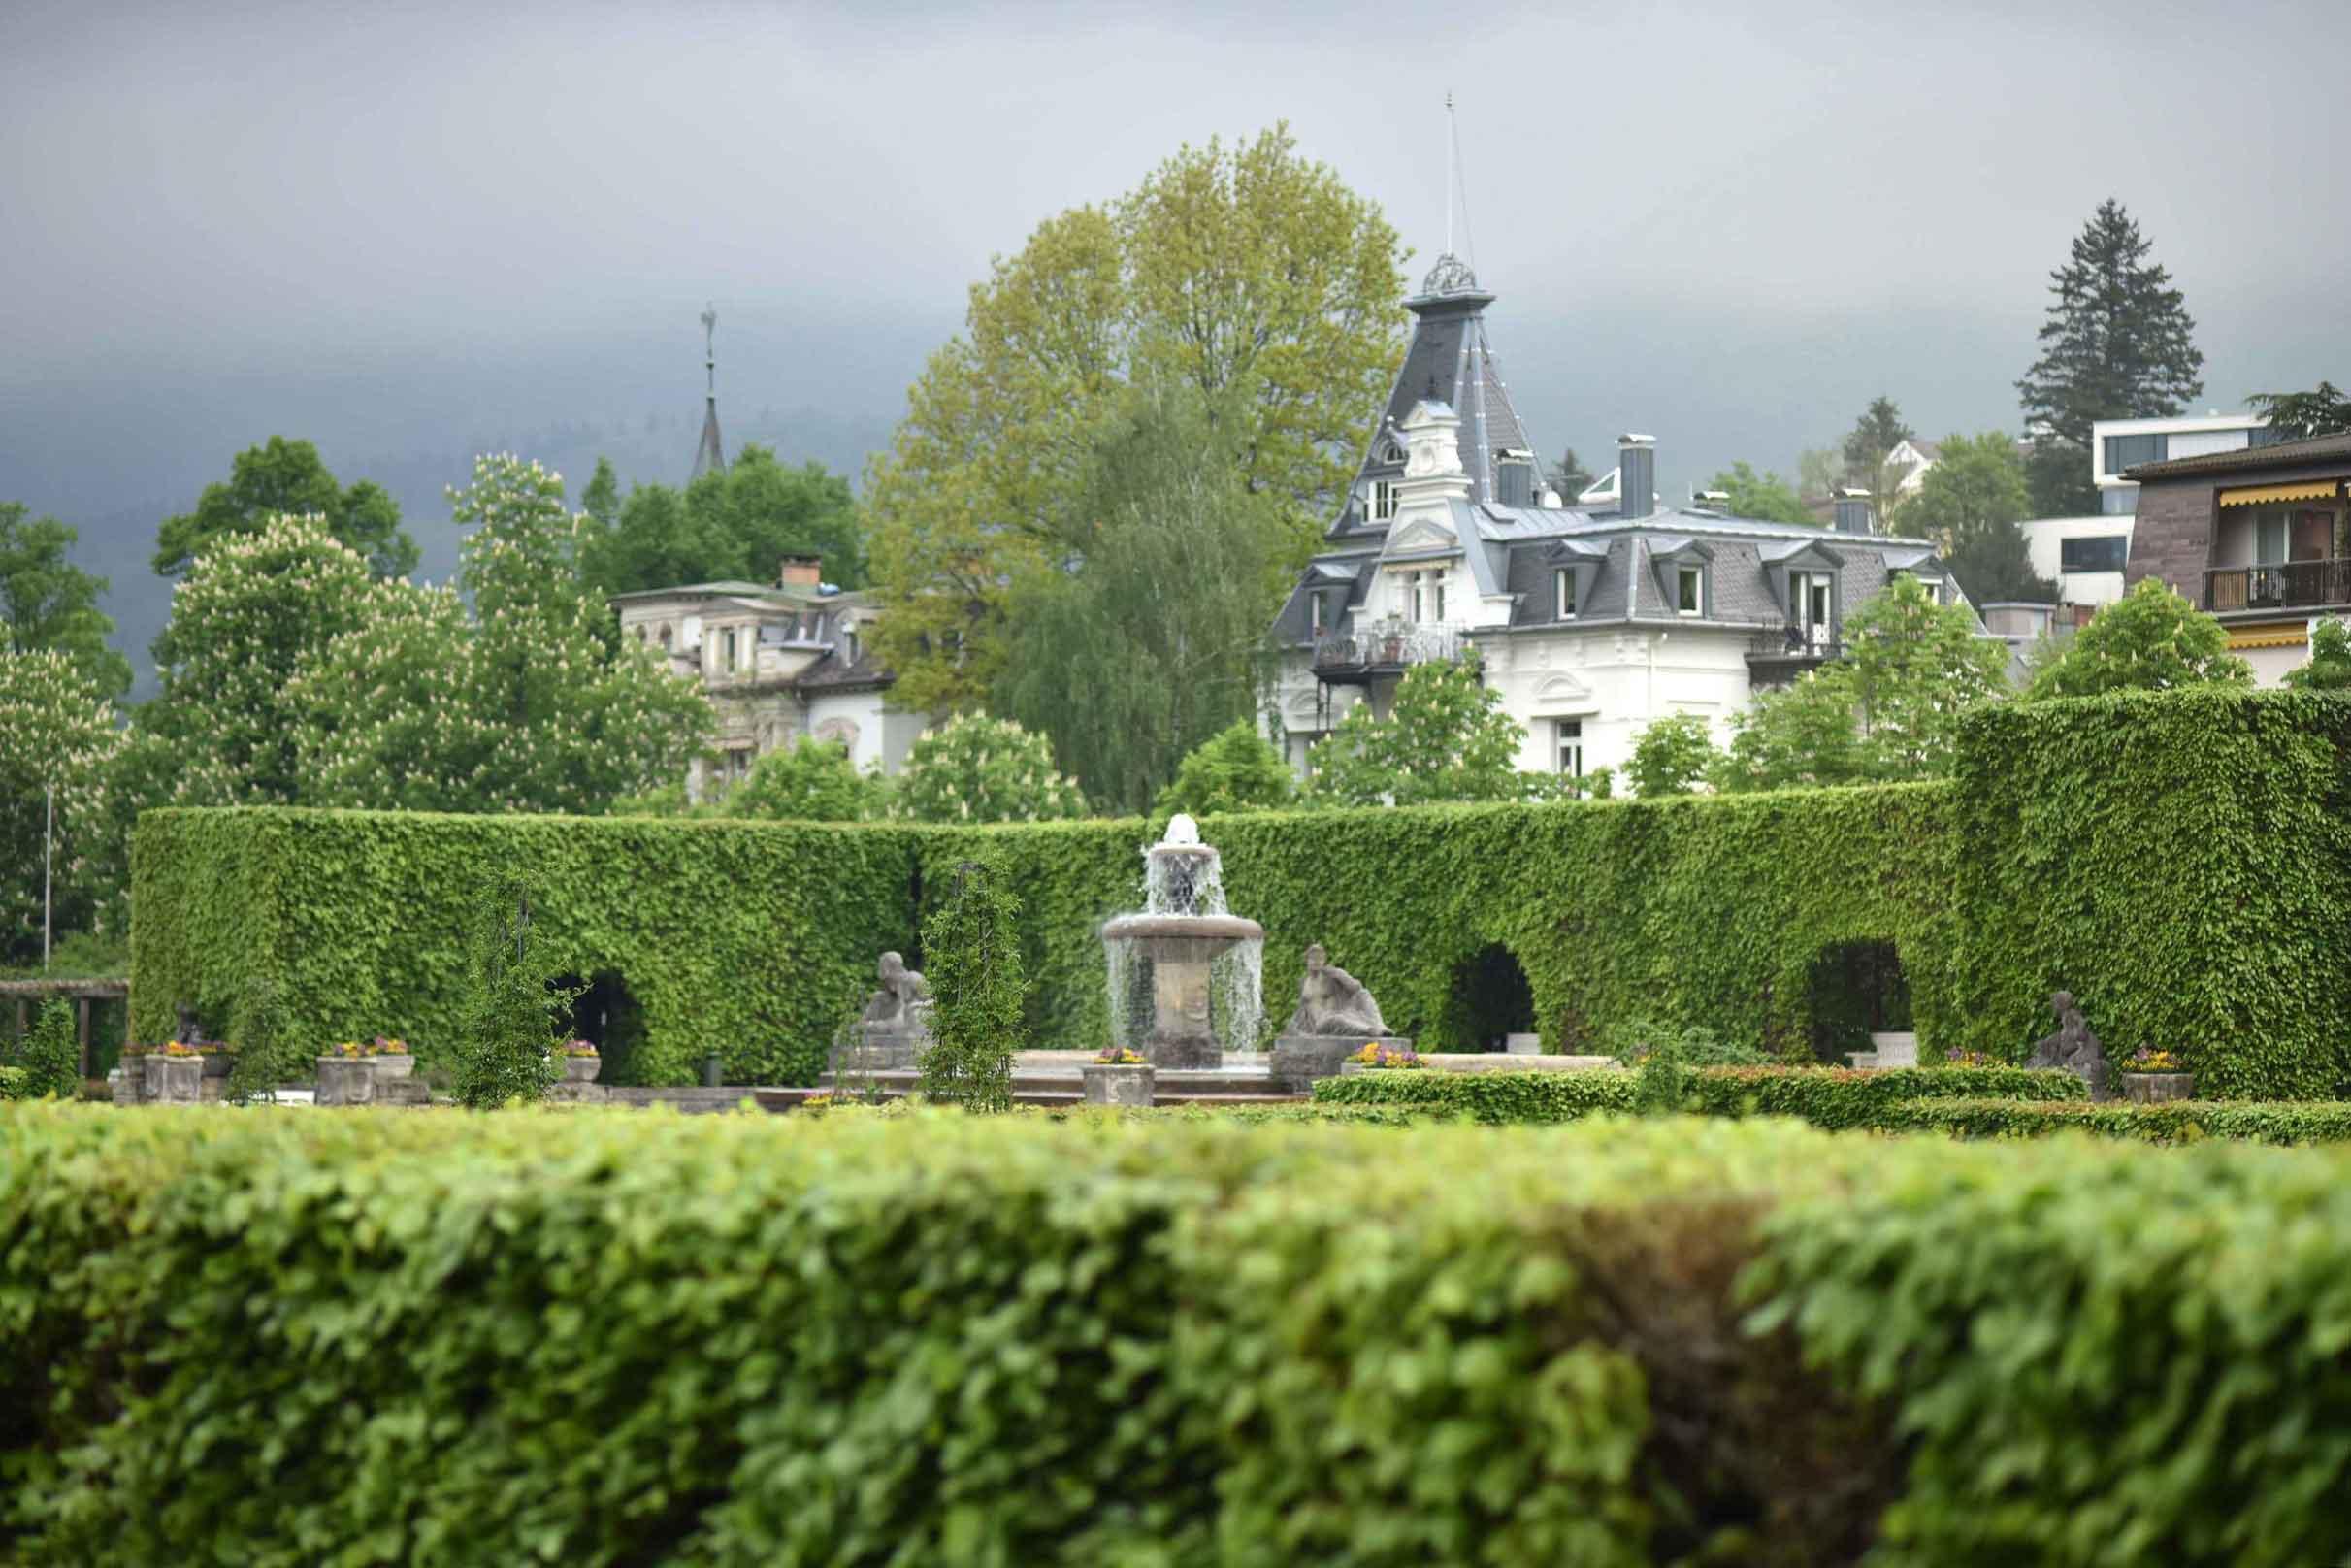 Goenneranlage, Baden Baden, Germany. Image©thingstodot.com